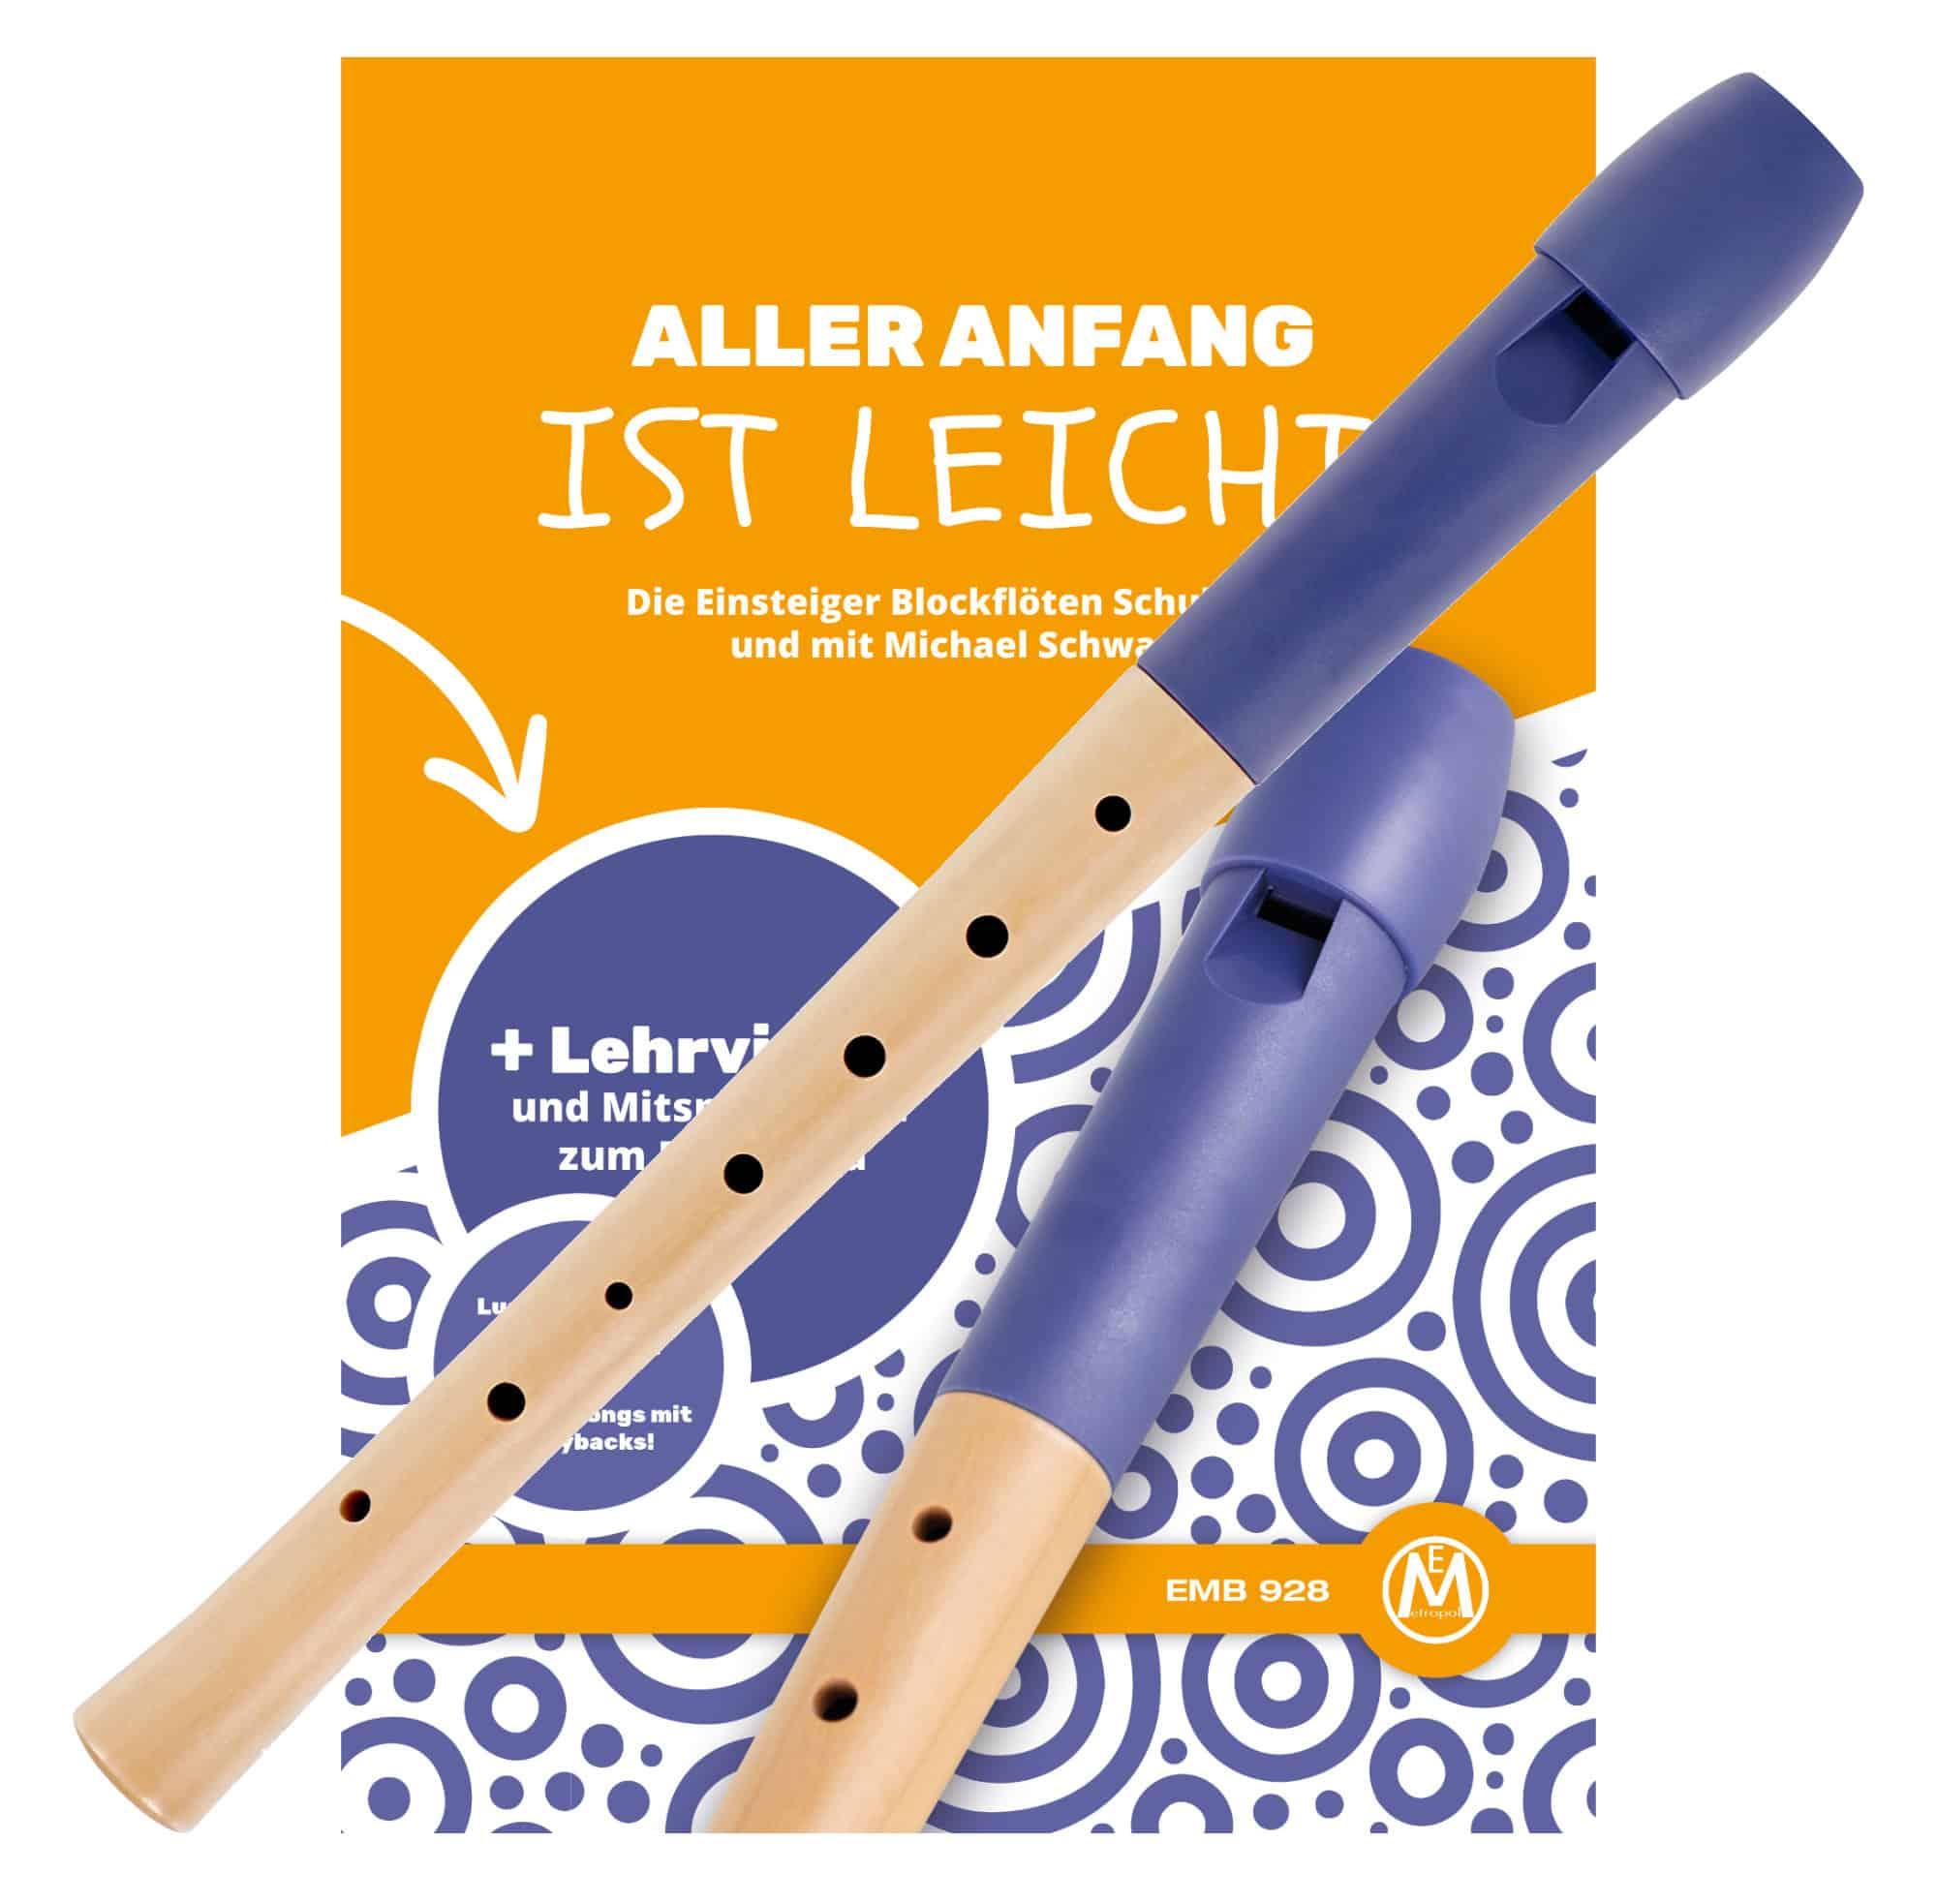 Classic Cantabile Pivella Blockflöte deutsch blau Set inkl. Flötenschule 'Aller Anfang ist leicht'